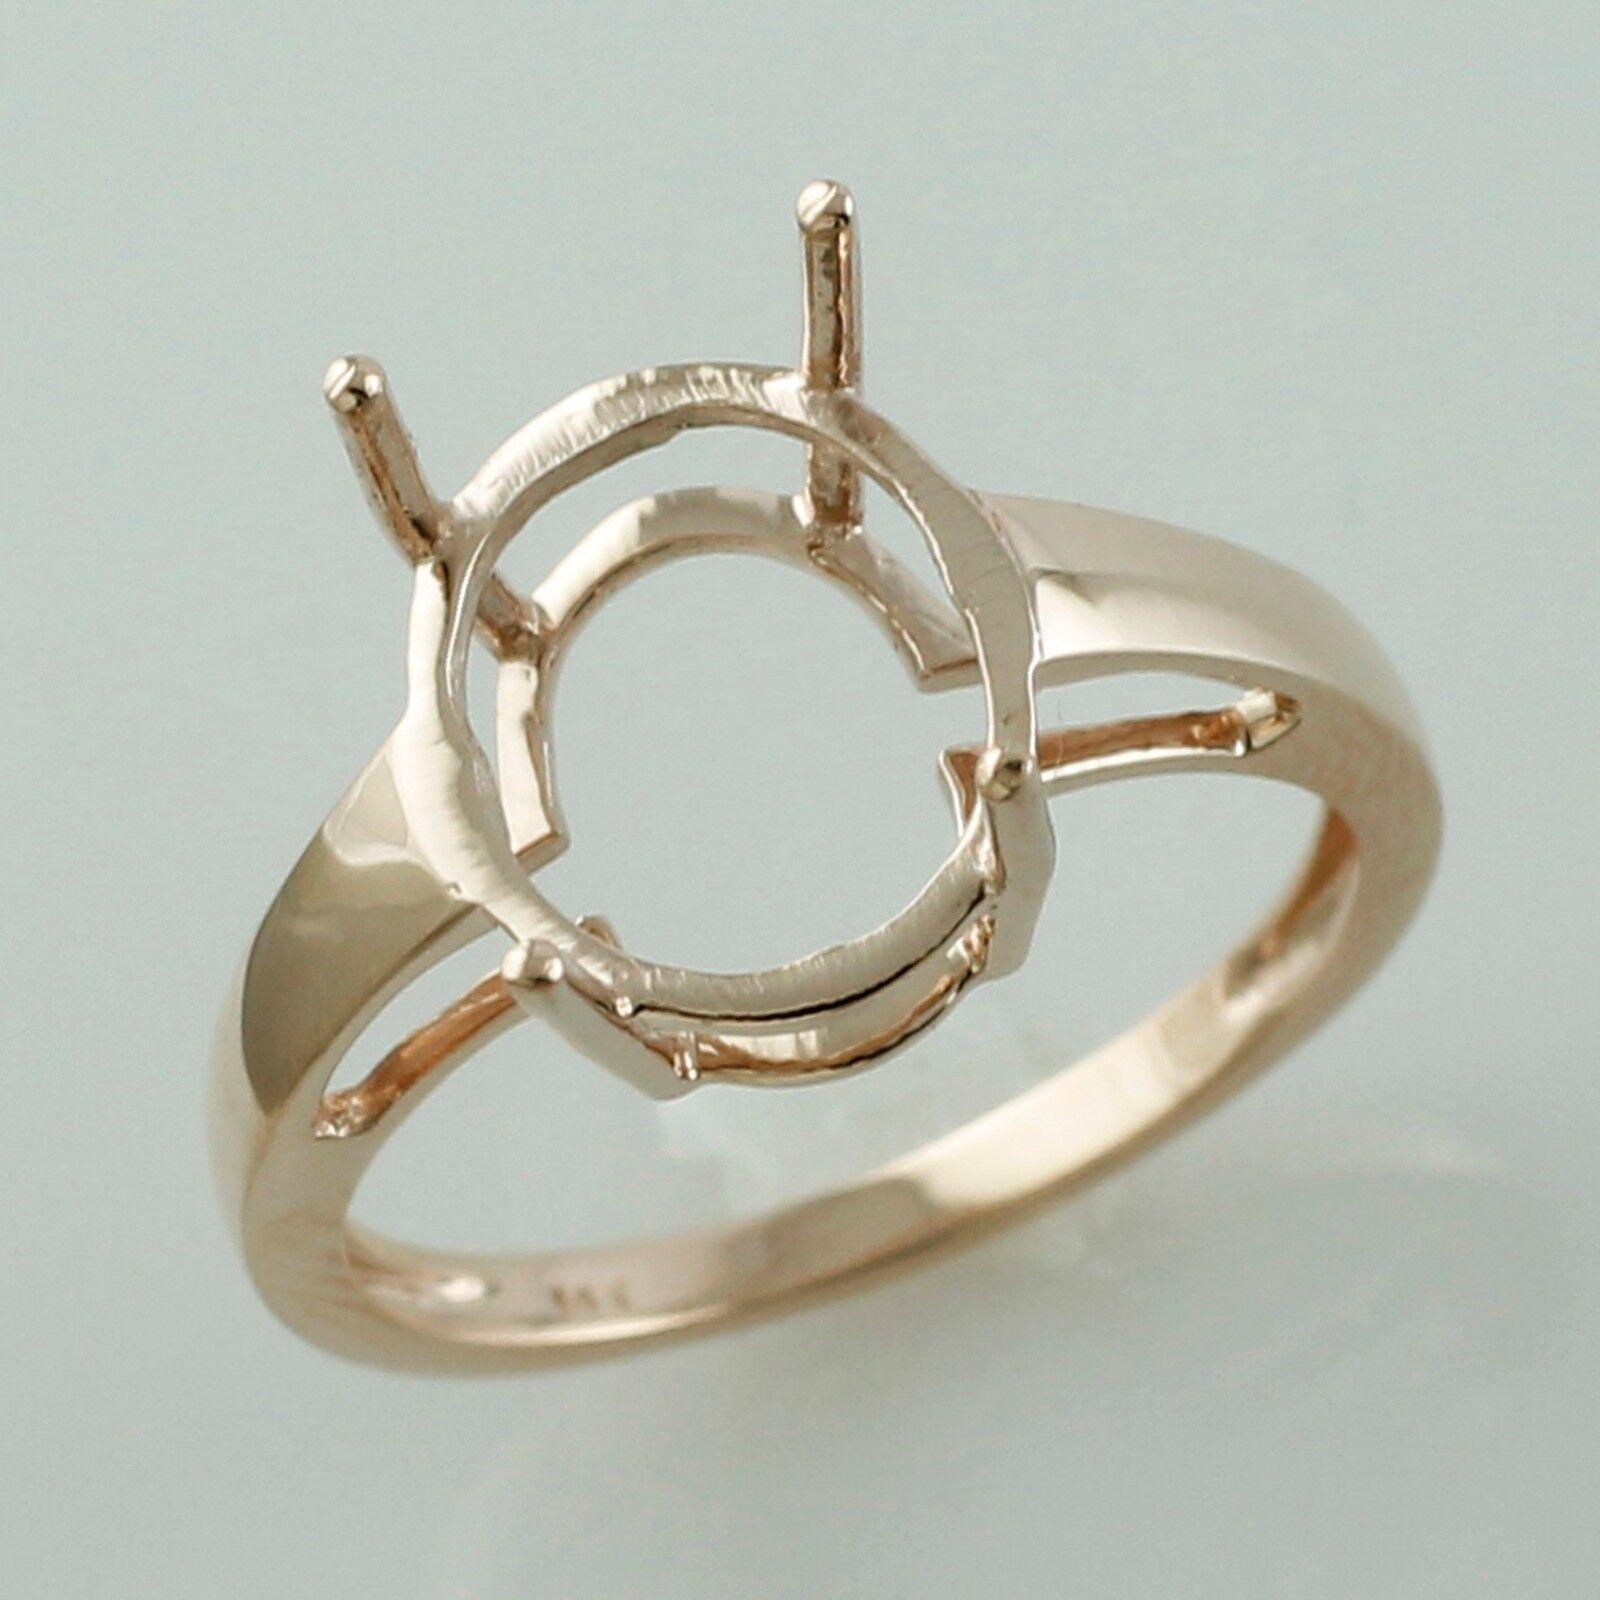 10x12 MM Semi Mount Ring Oval Shape gold Anniversary Wedding Women Gift Jewelry